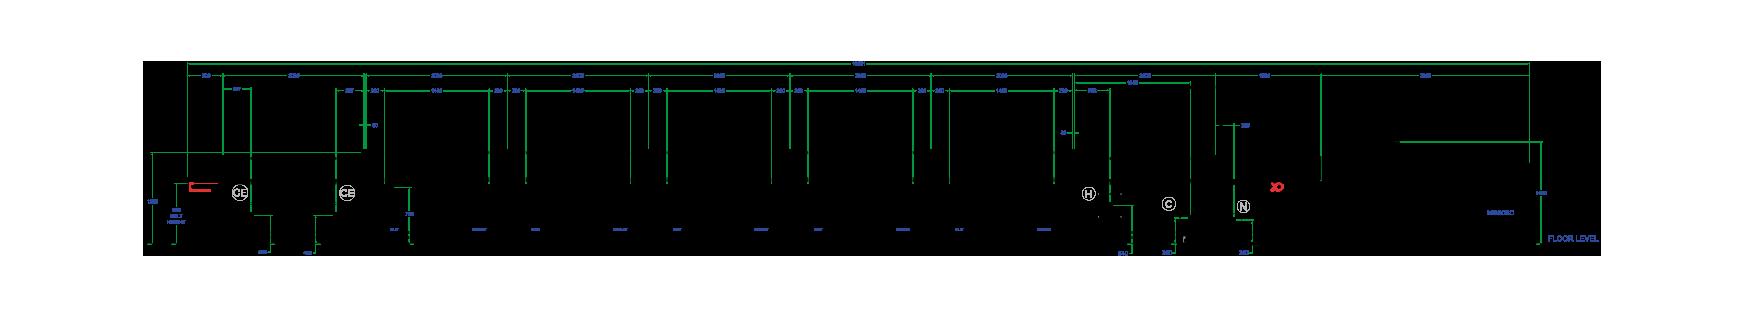 graph-2.png